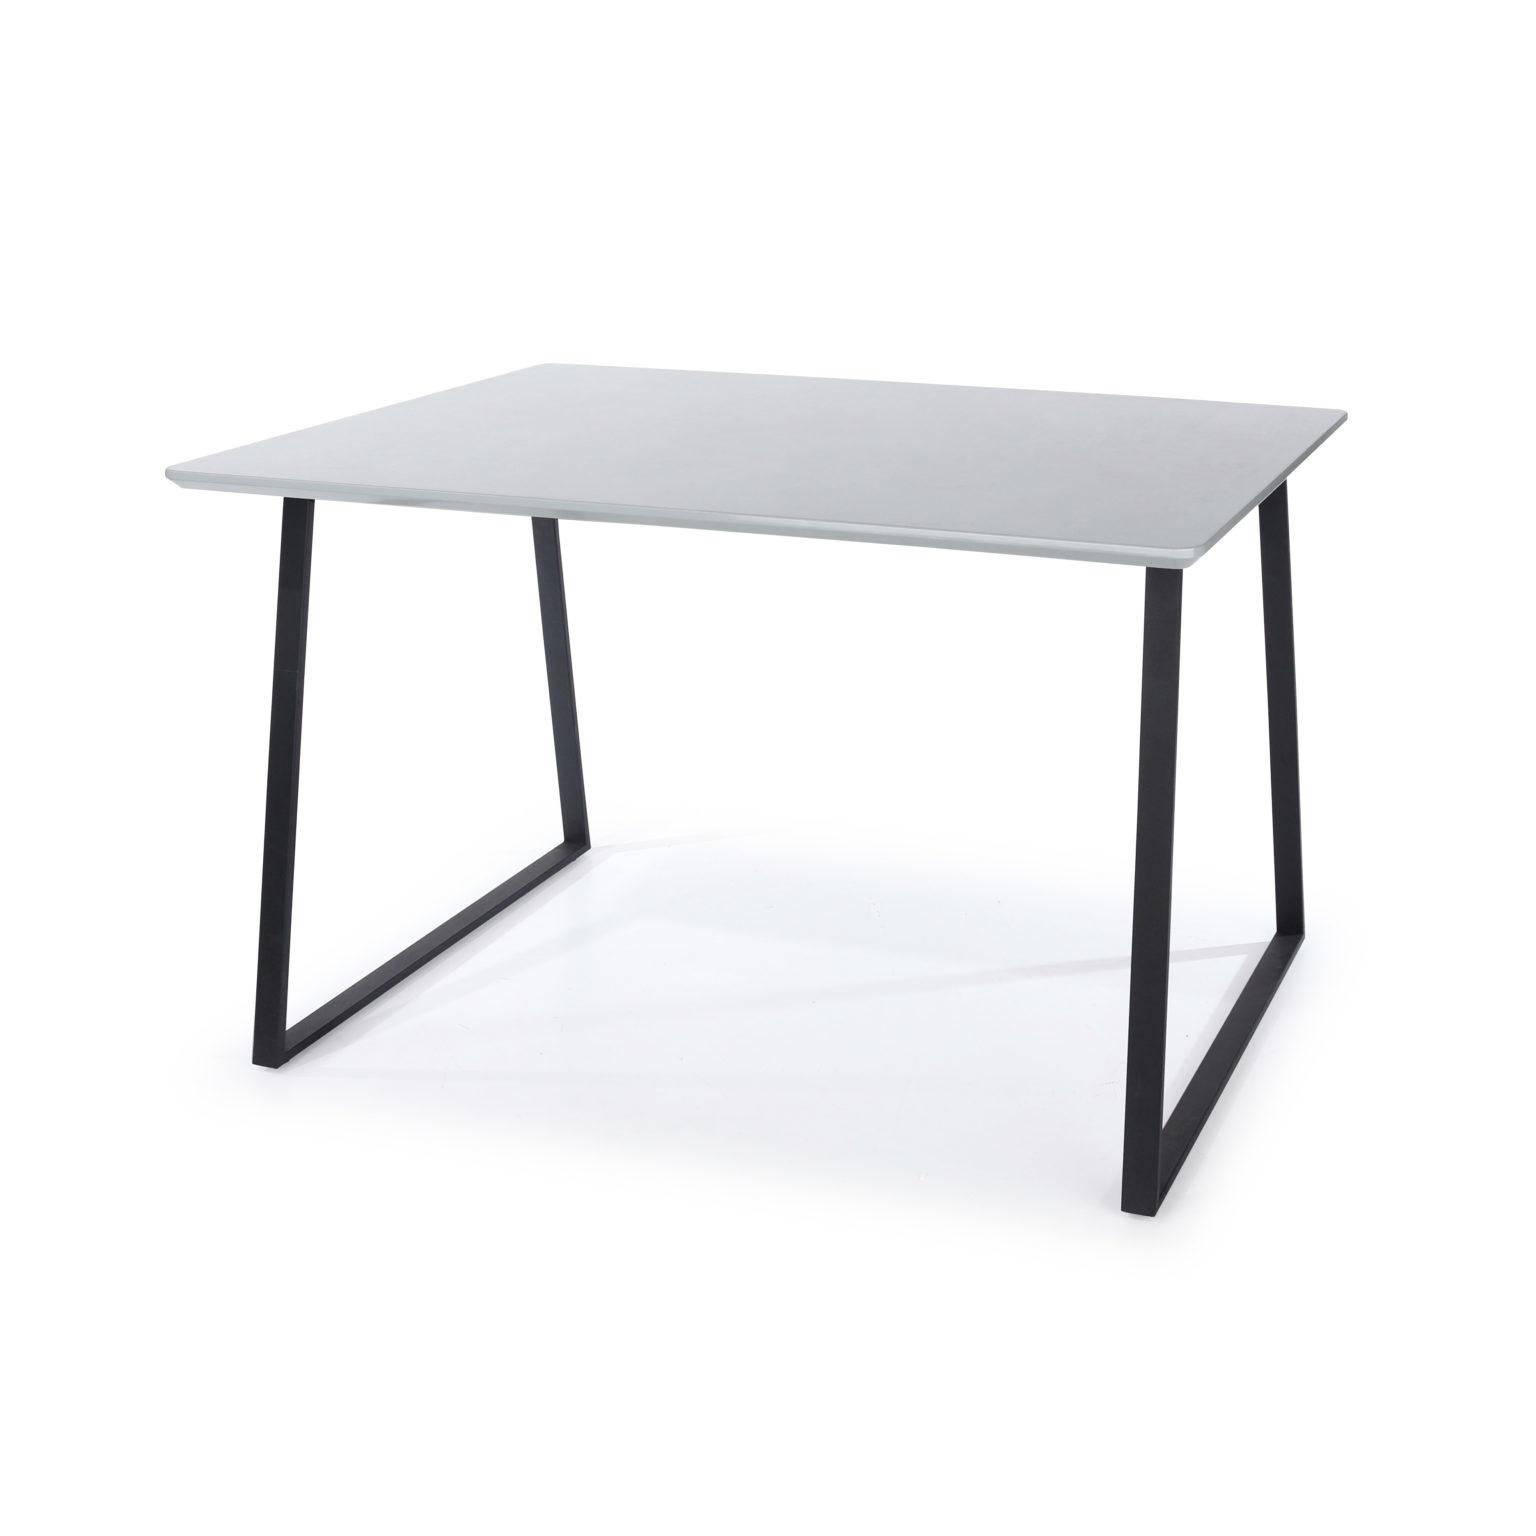 Aspen Dining Table Metal Legs Grey Gloss